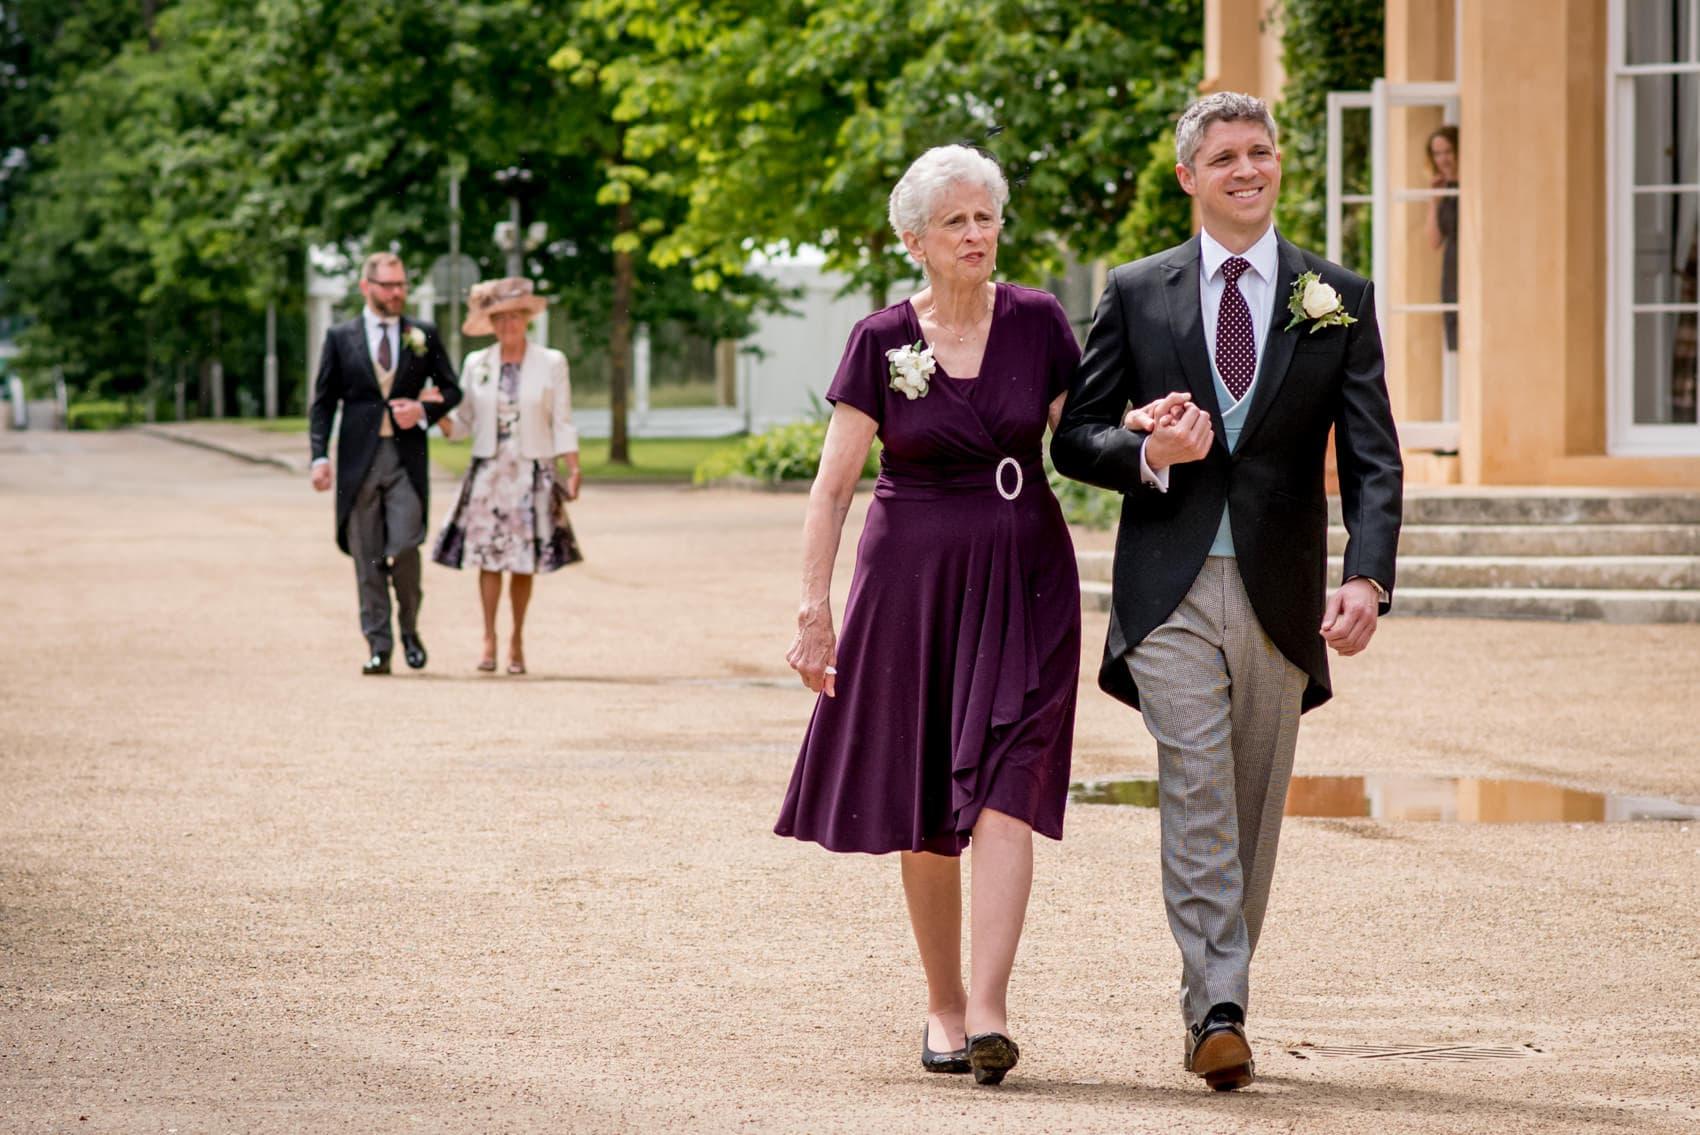 Ditton wedding